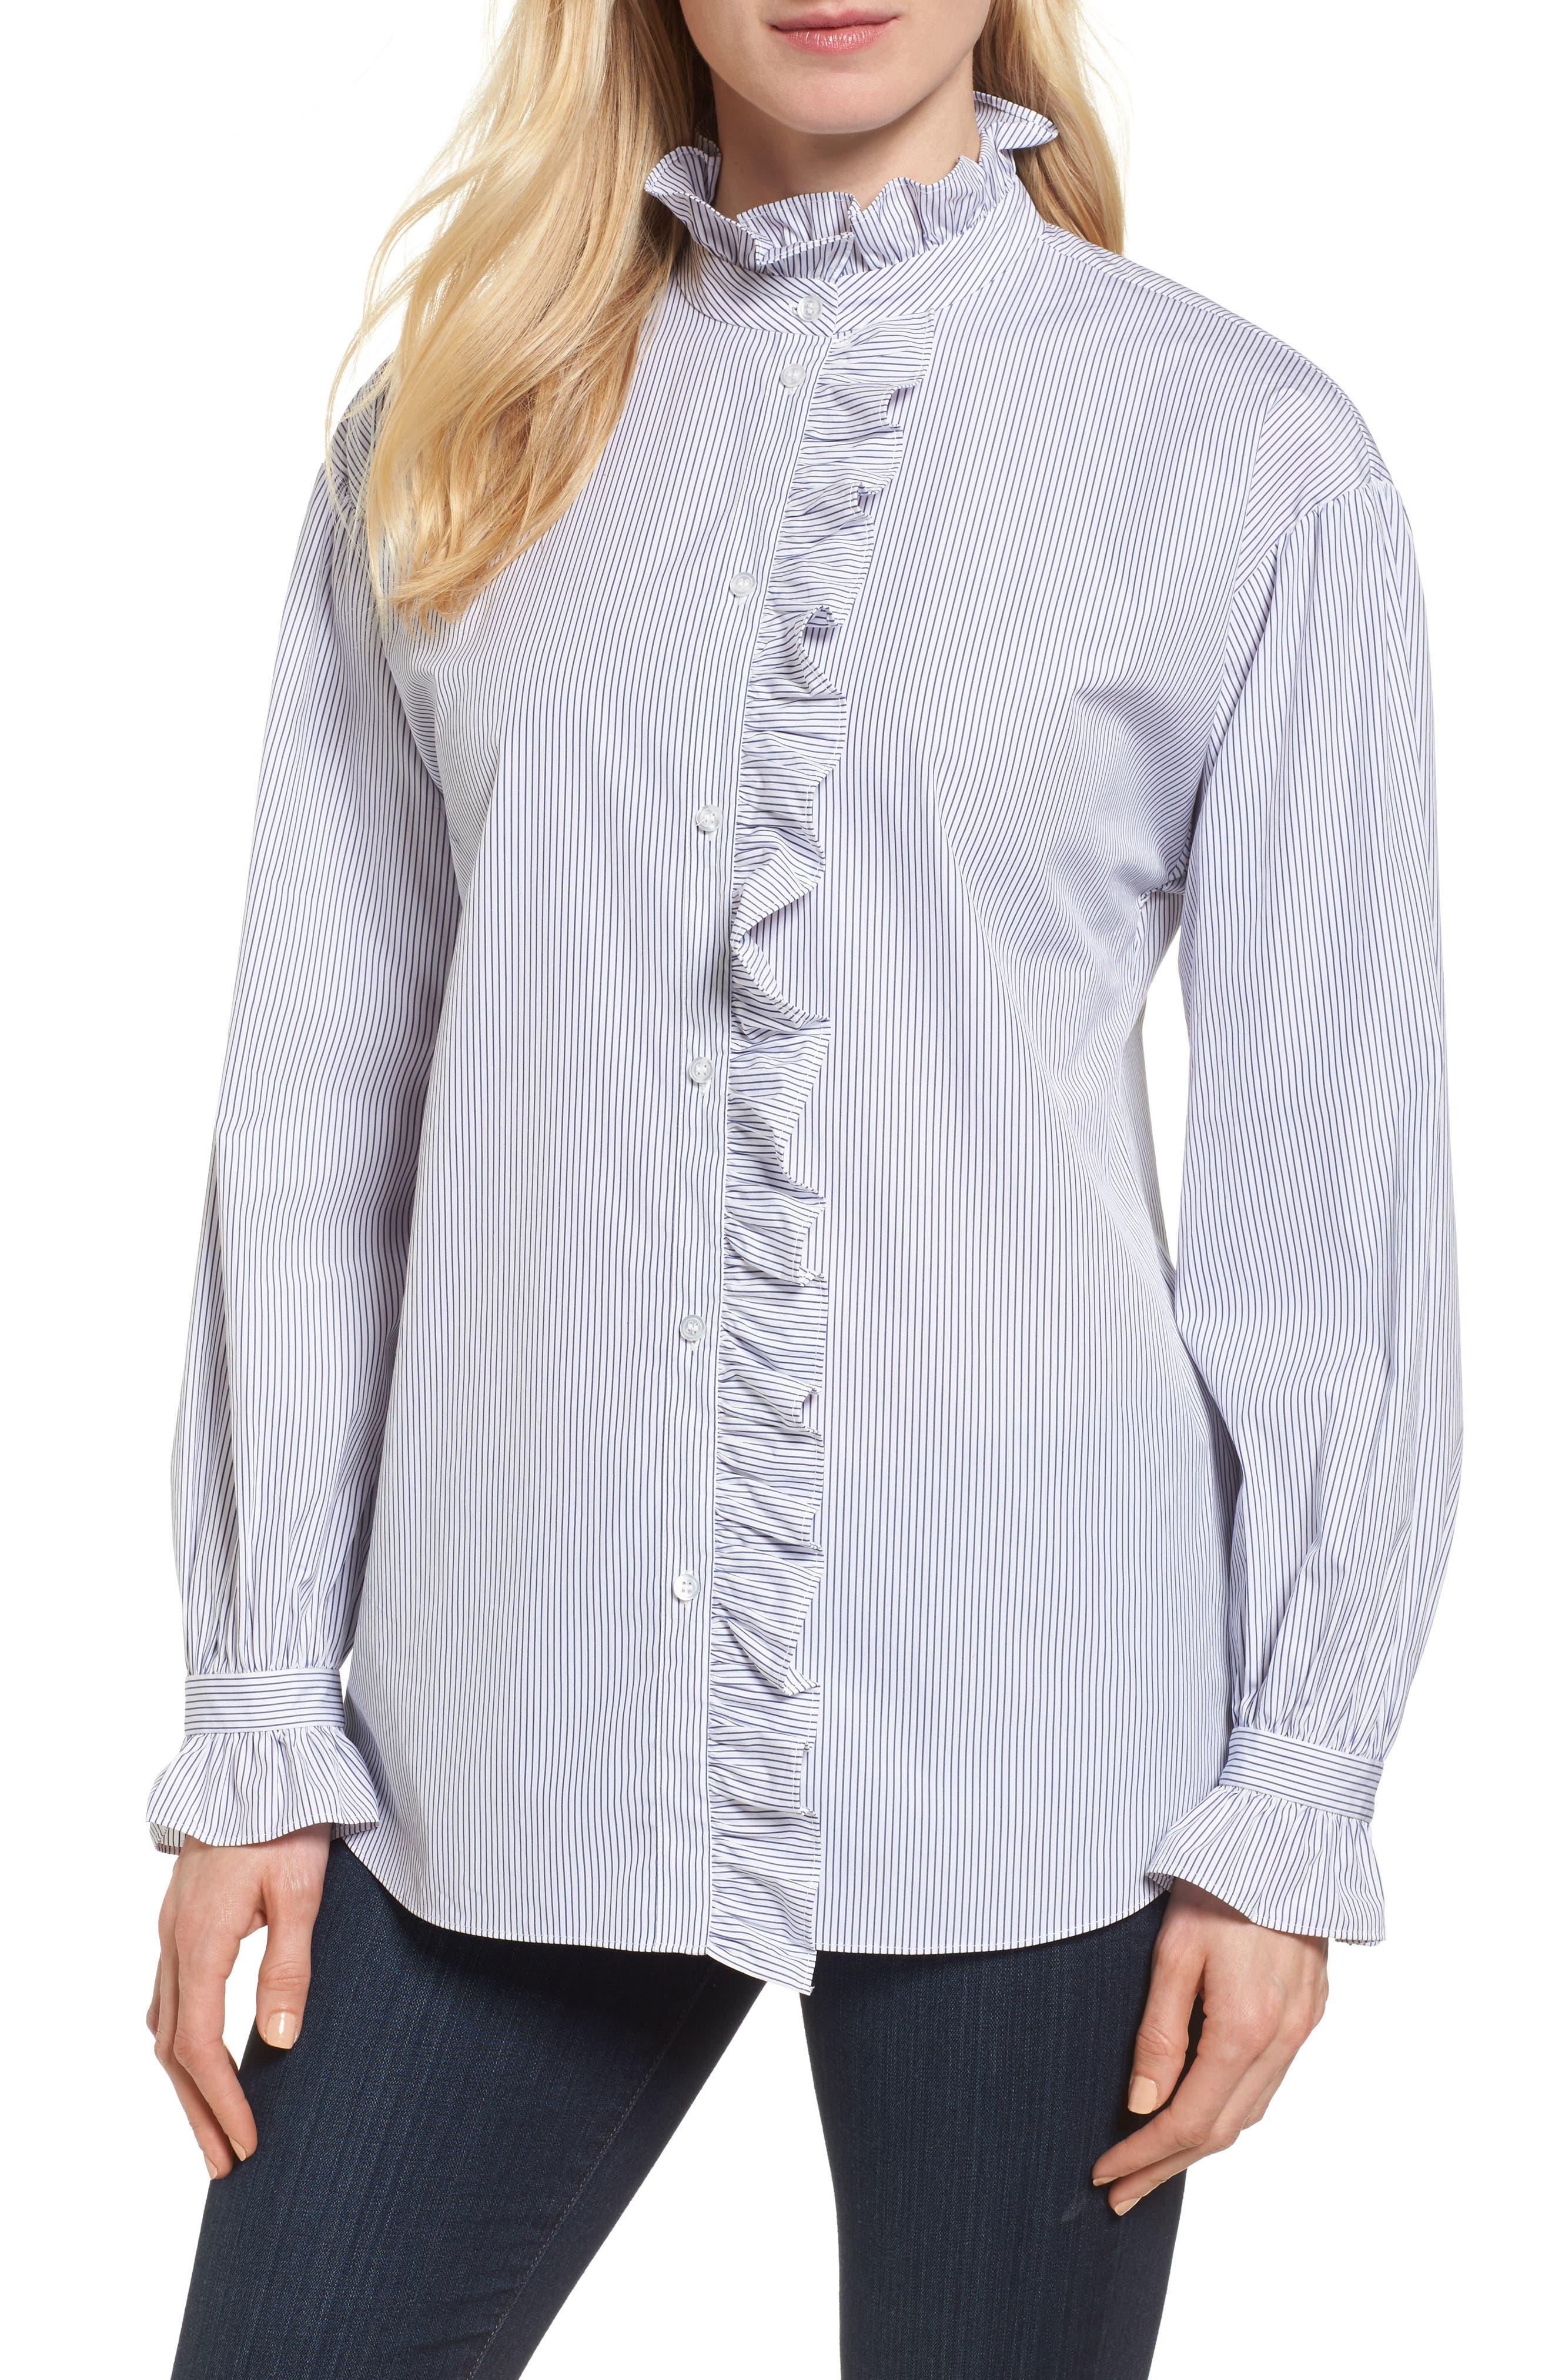 Ruffle Stripe Shirt,                         Main,                         color, White- Navy Thin Stripe